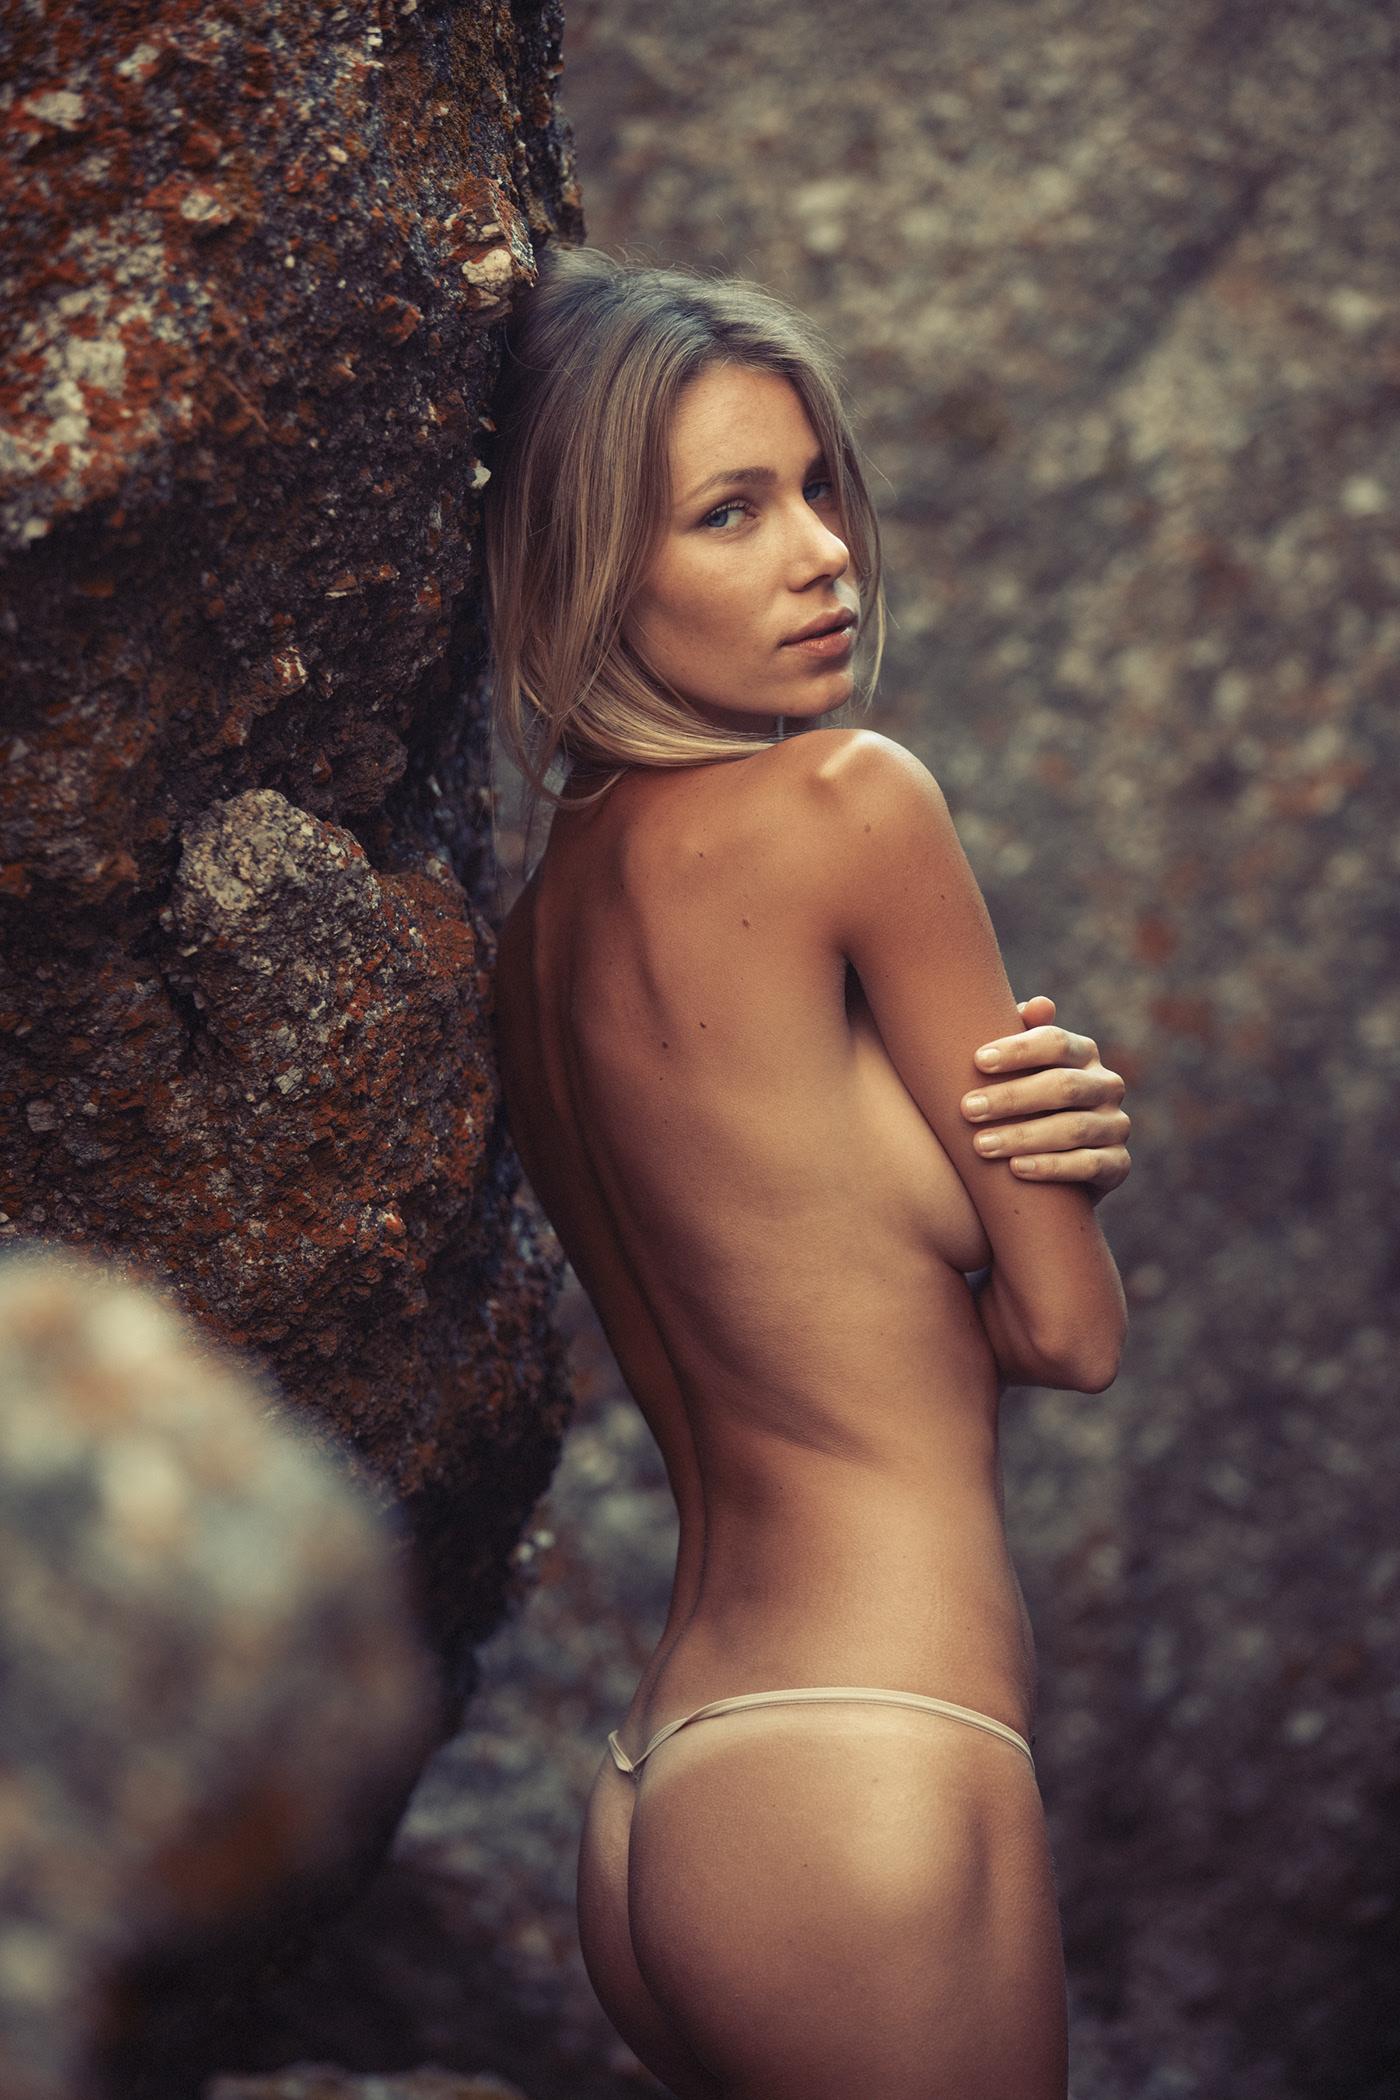 Gracie in Morning Mist shot for Rektmag | фото Gary Huddlestone